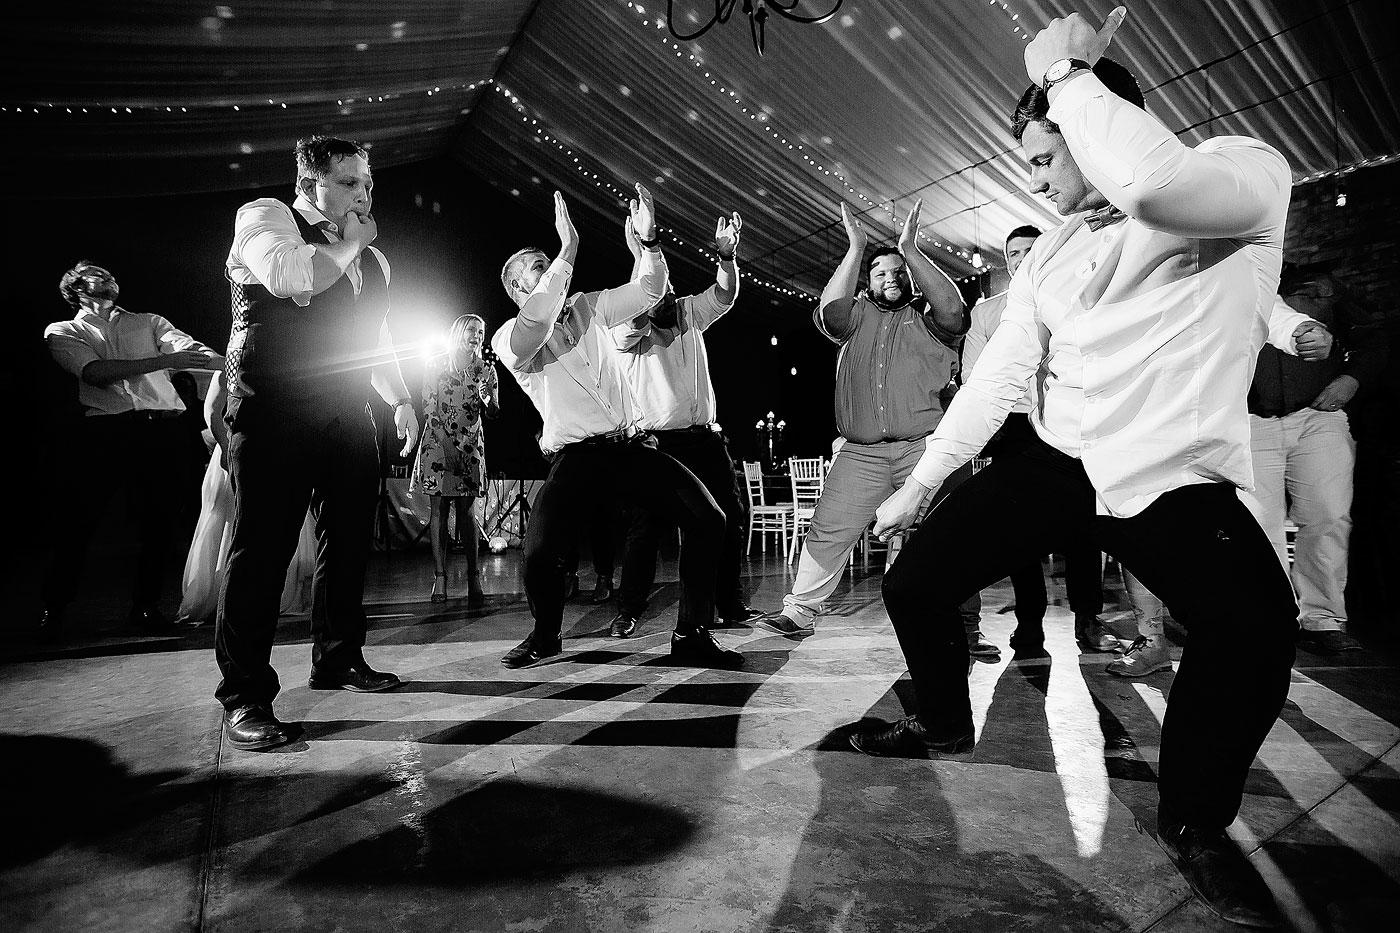 Crazy Dancing between the Groomsmen at South African Wedding.